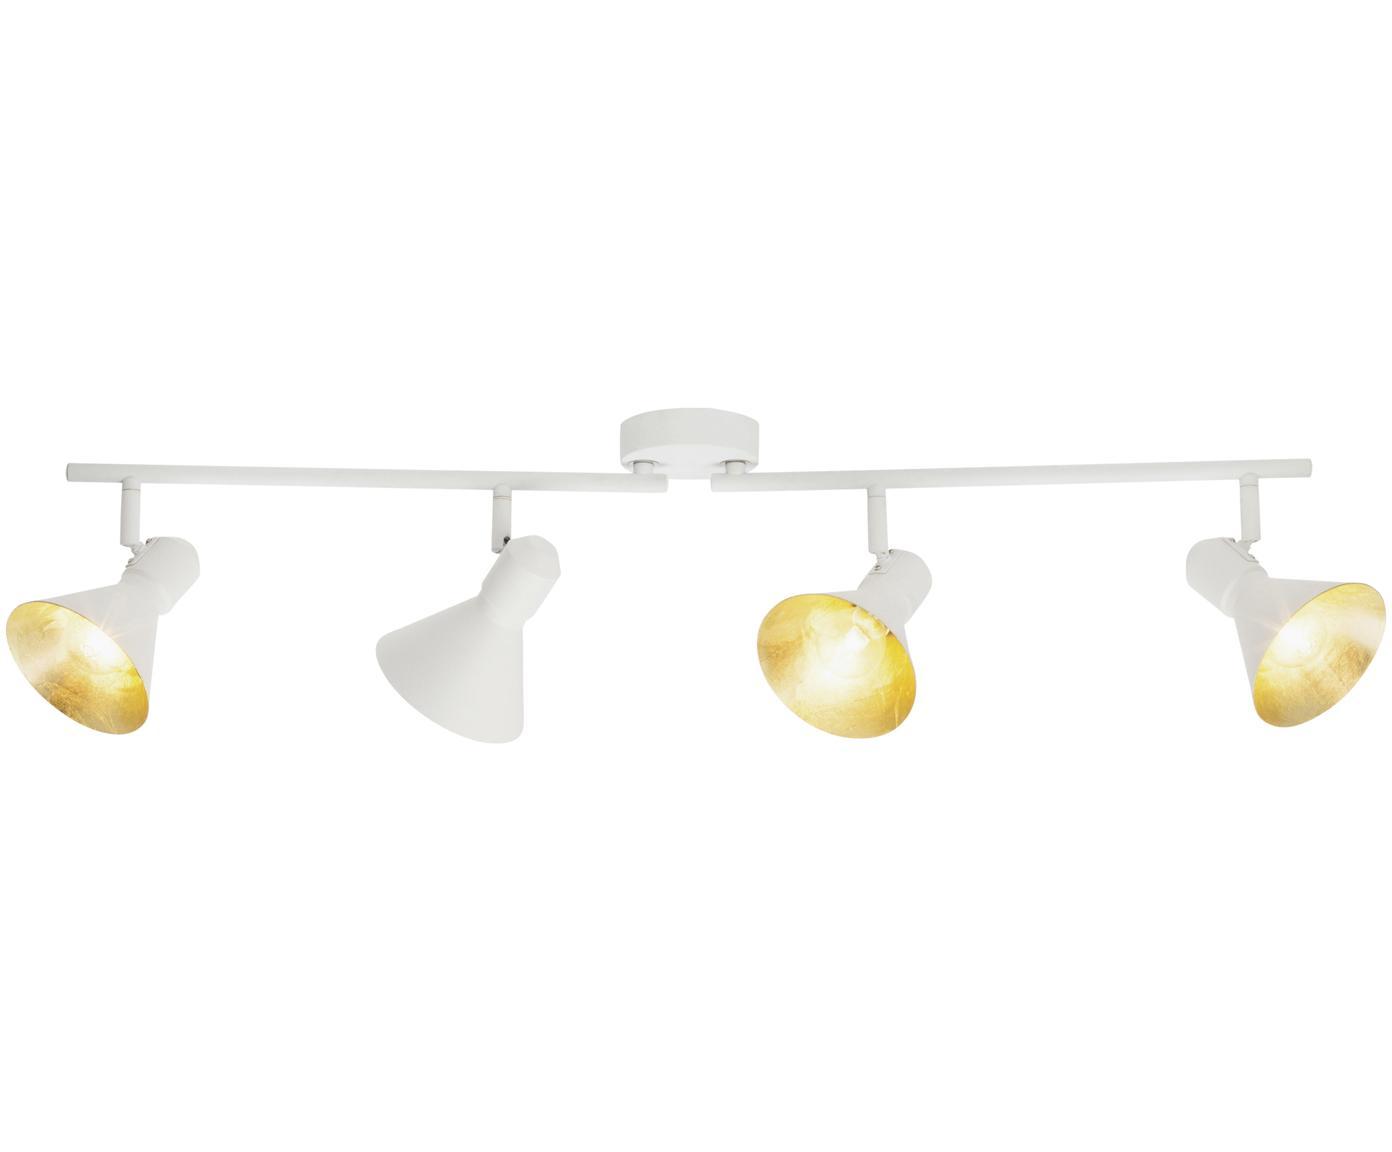 Faretti da soffitto Aztekas, Metallo, Bianco, Larg. 90 x Alt. 18 cm